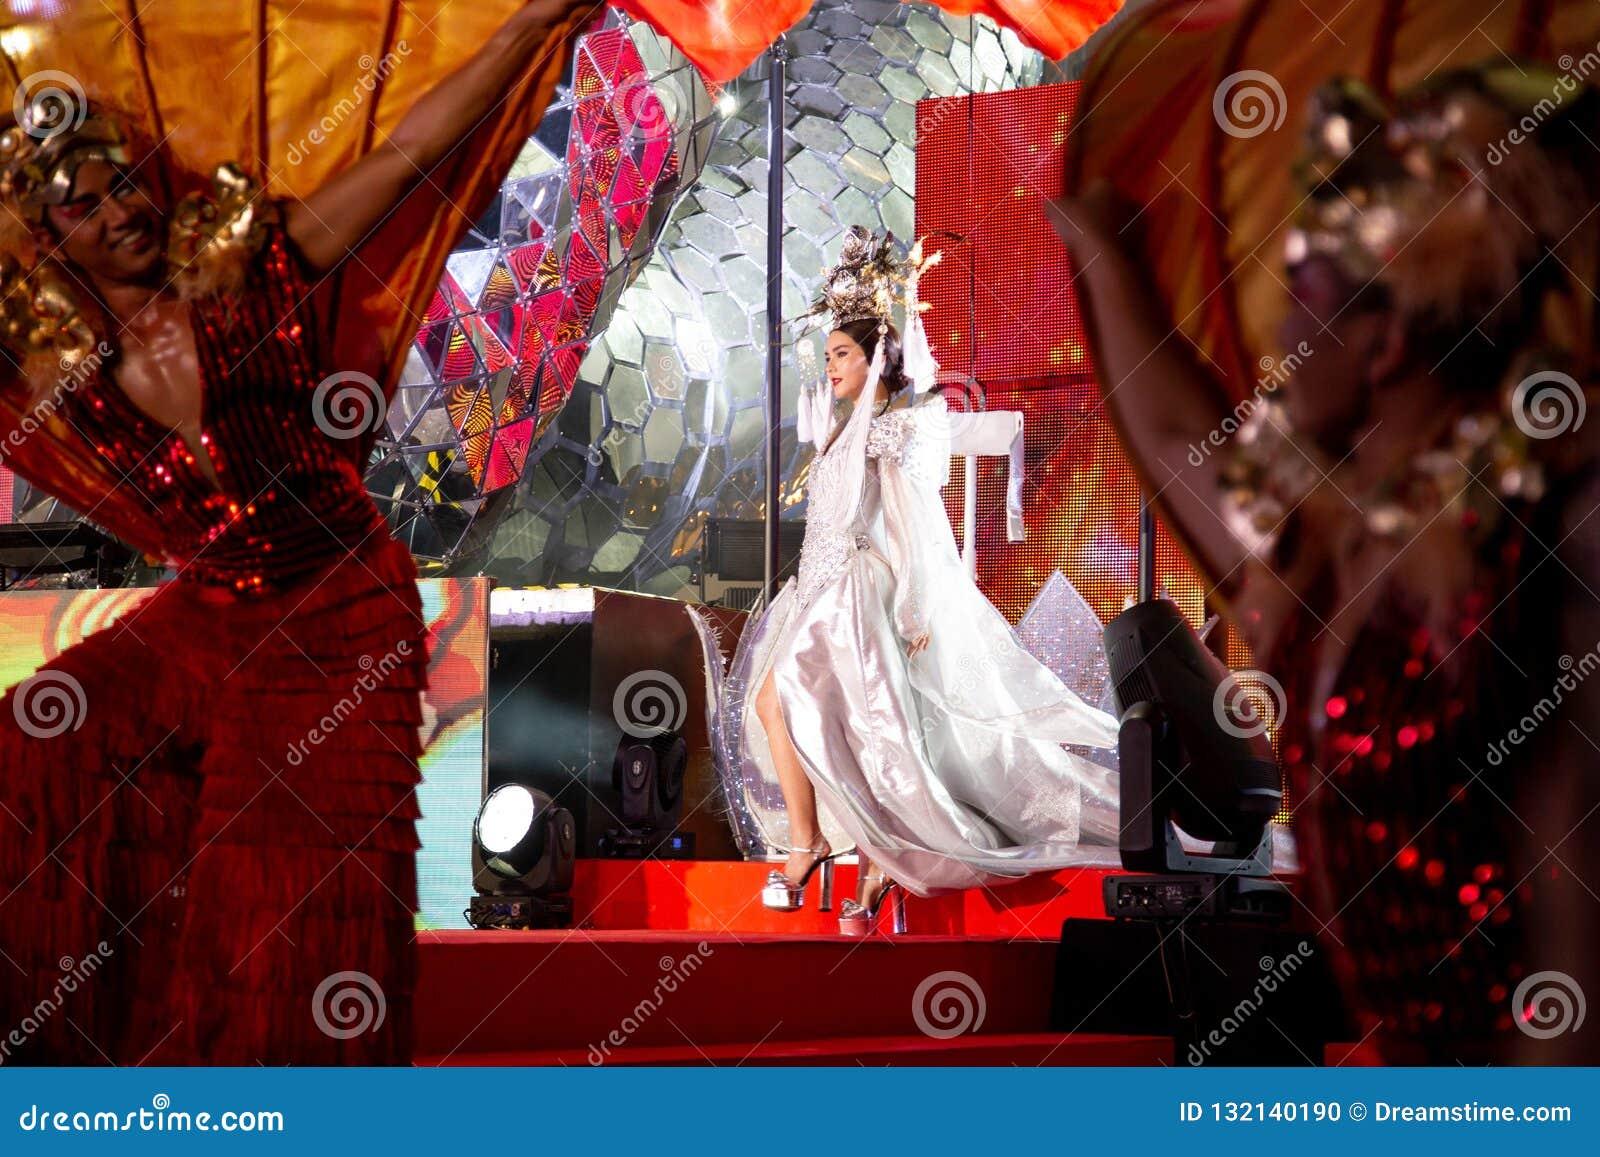 BANGKOK, THAILAND - FEBRUARY 2018: Chinese New Year celebration show at EmQuartier and Emporium shopping mall.